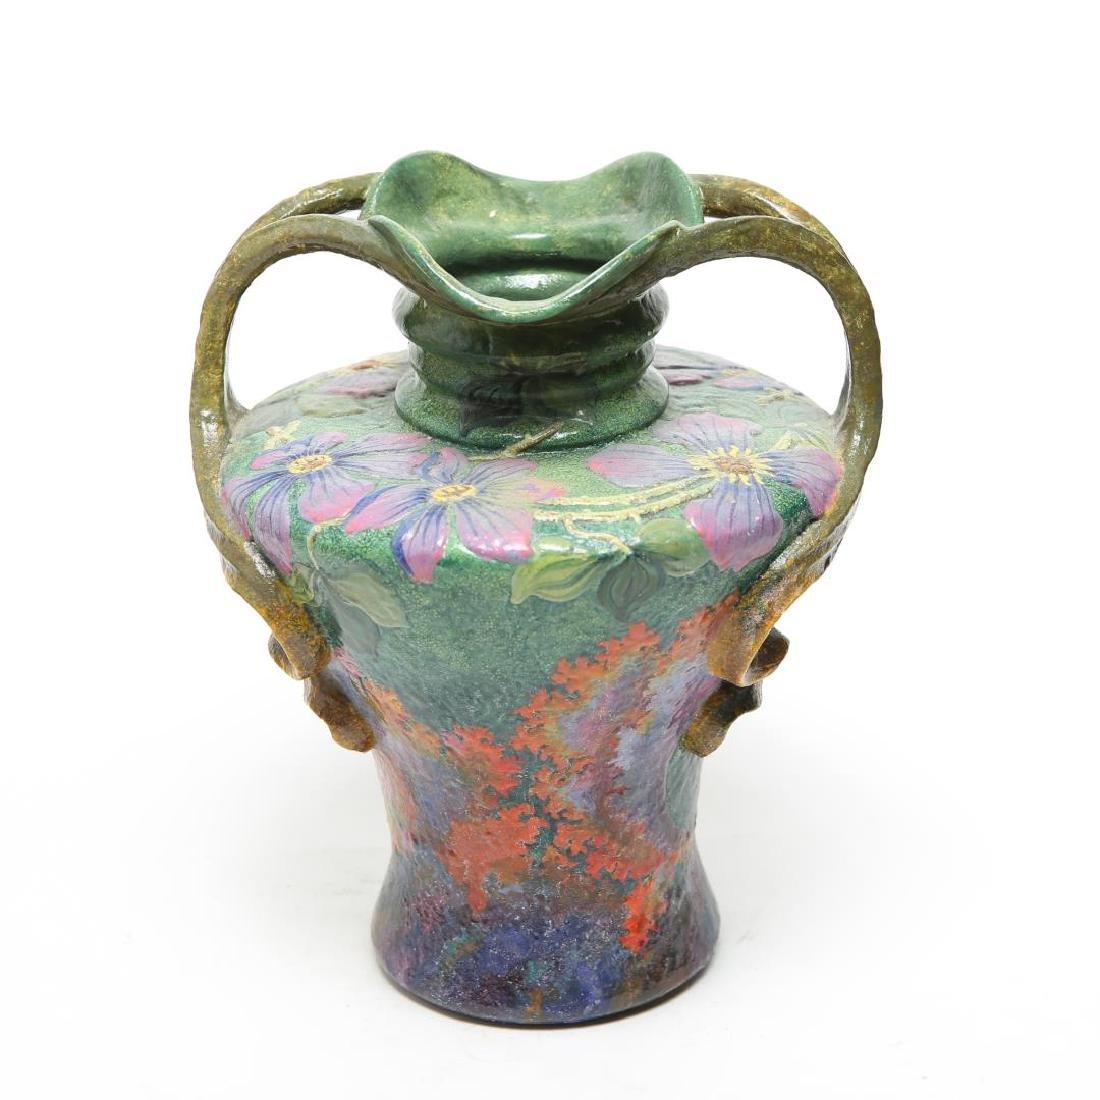 Royal Bonn Ruysdael Vase, Art Nouveau Ceramic